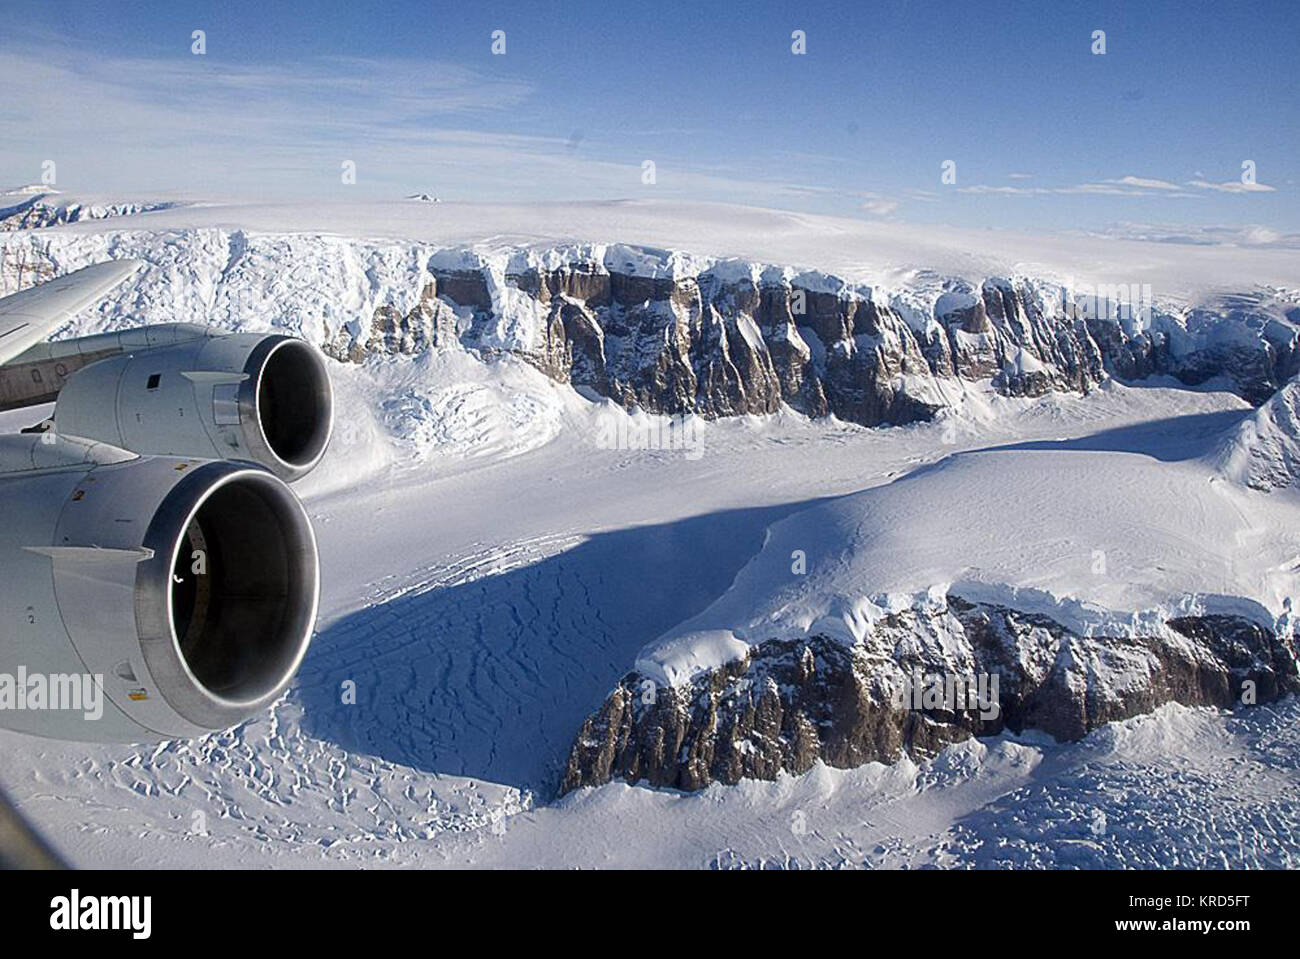 A Tour of the Antarctic Cryosphere NASA - Stock Image